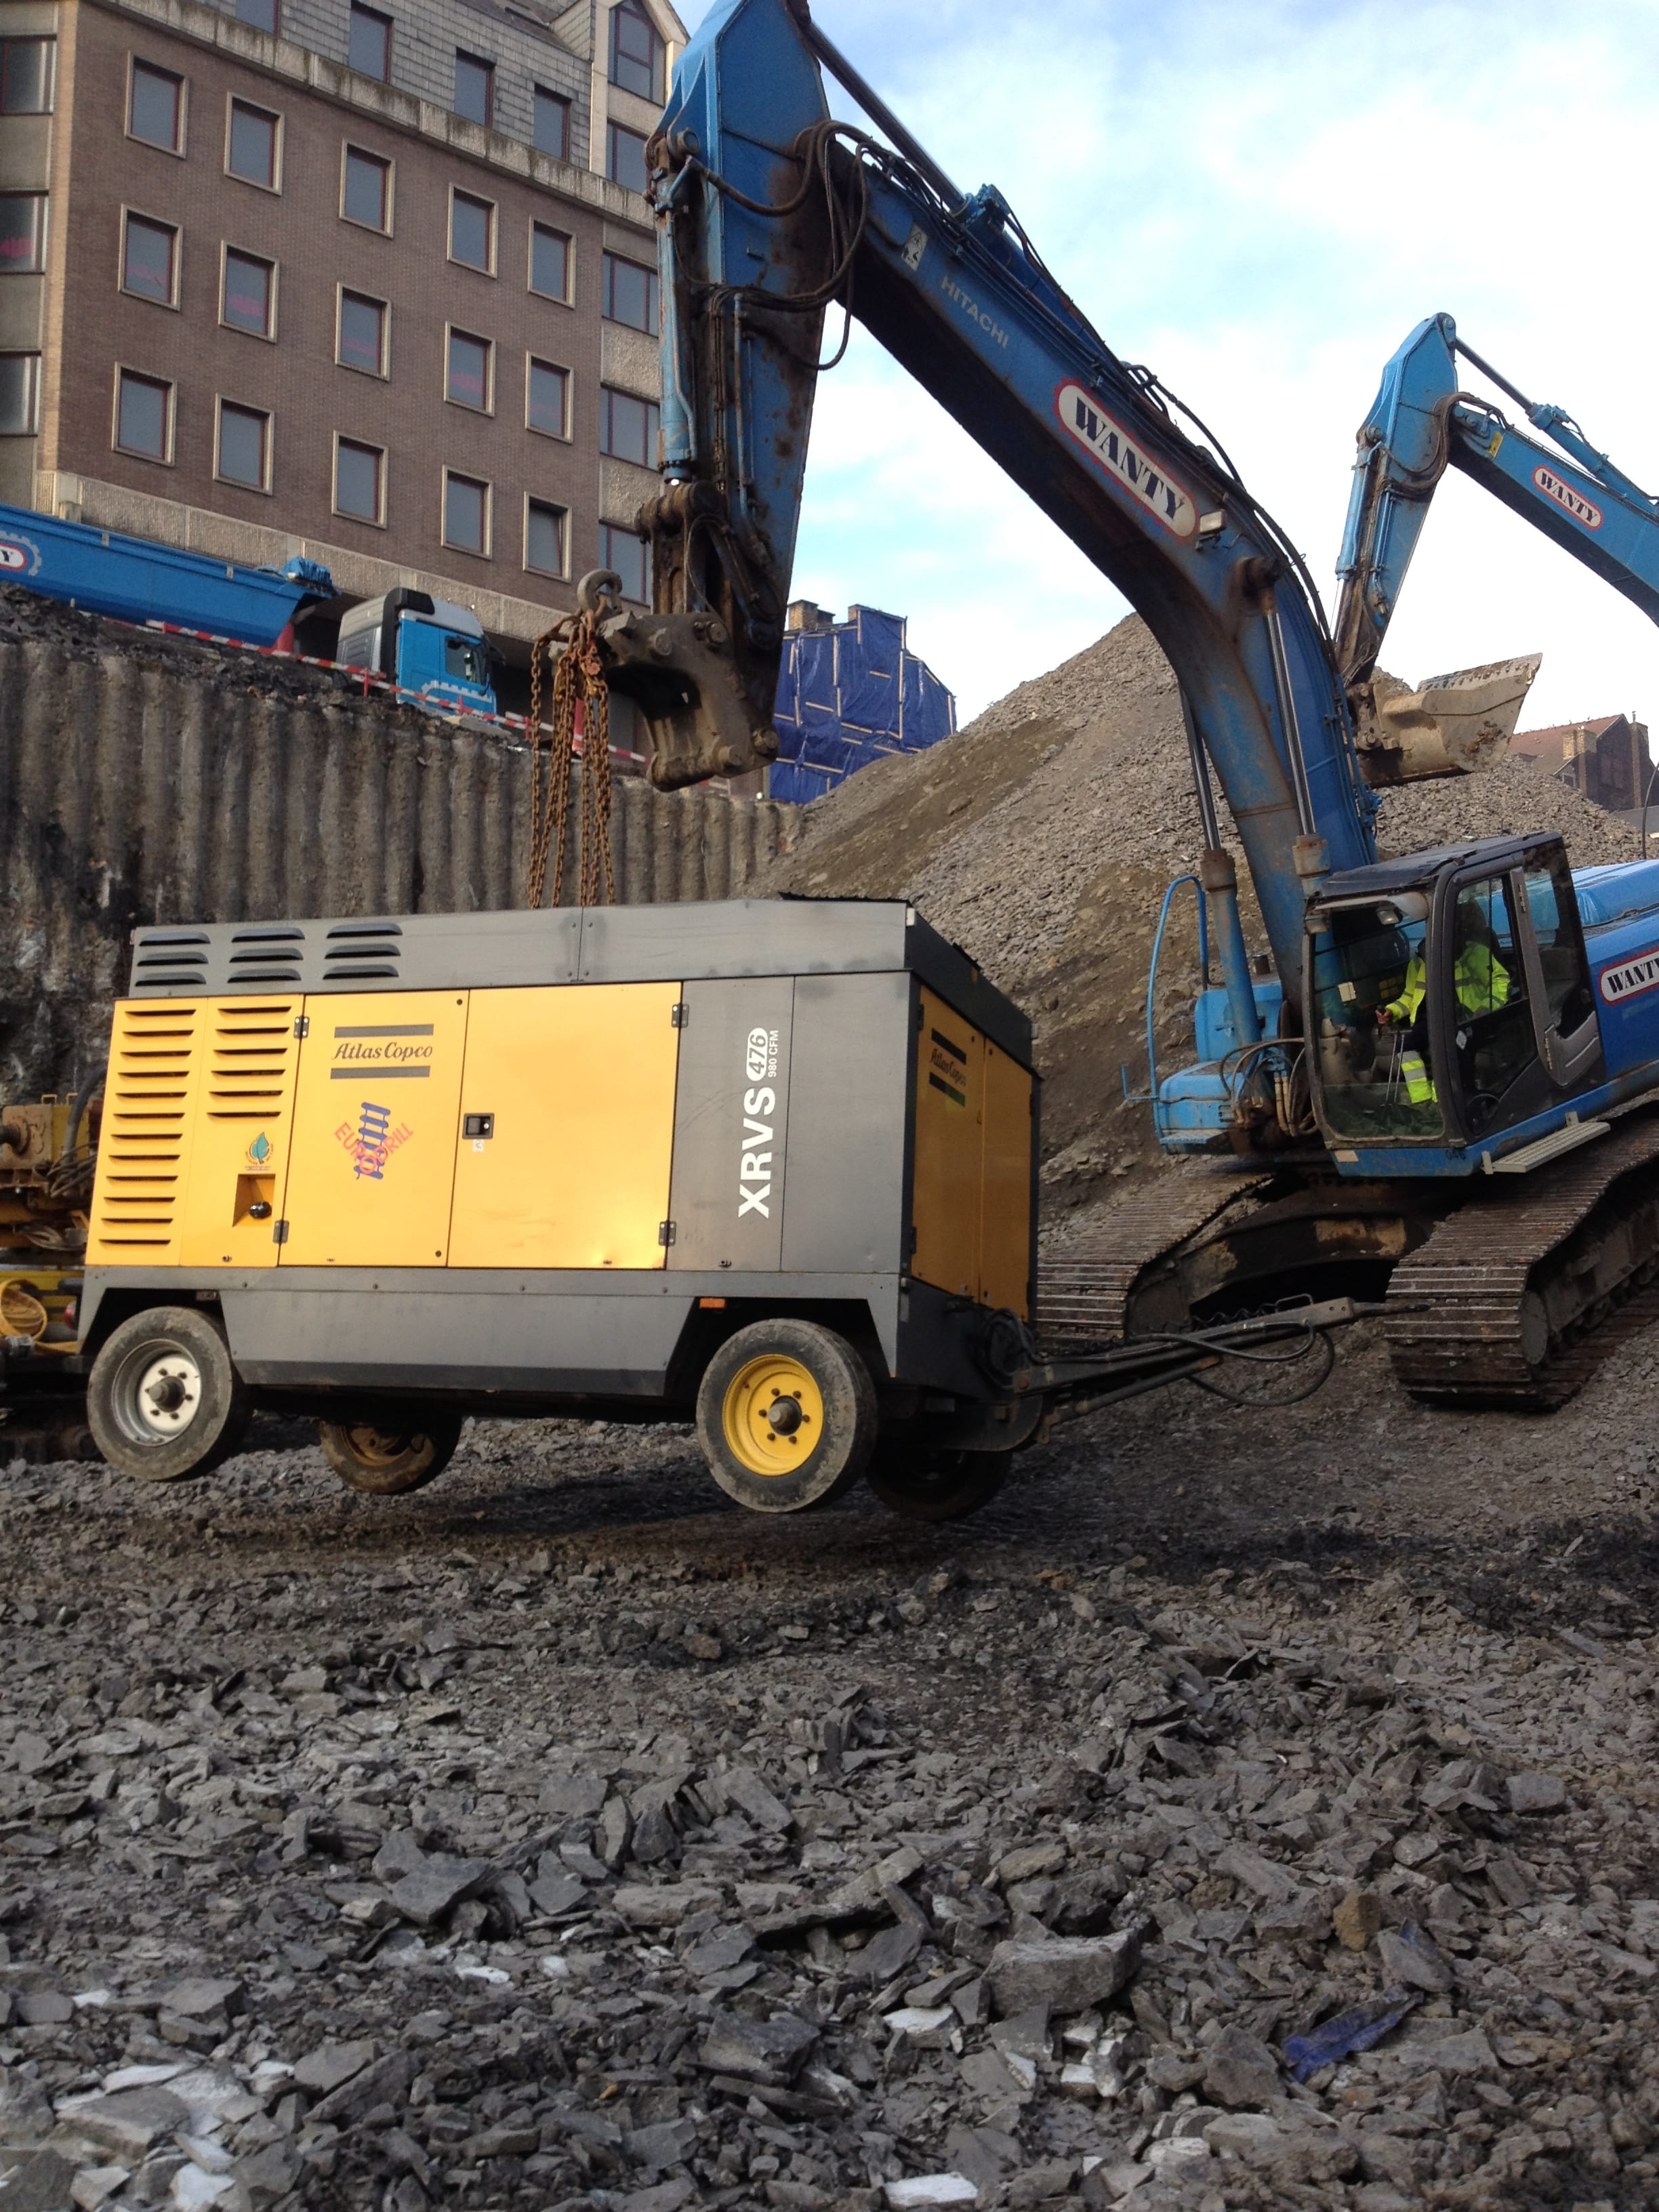 chantier-charleroi-rive-gauche-forage-installation-pompe-puits-geothermie-eurodrill-liege-belgique-4